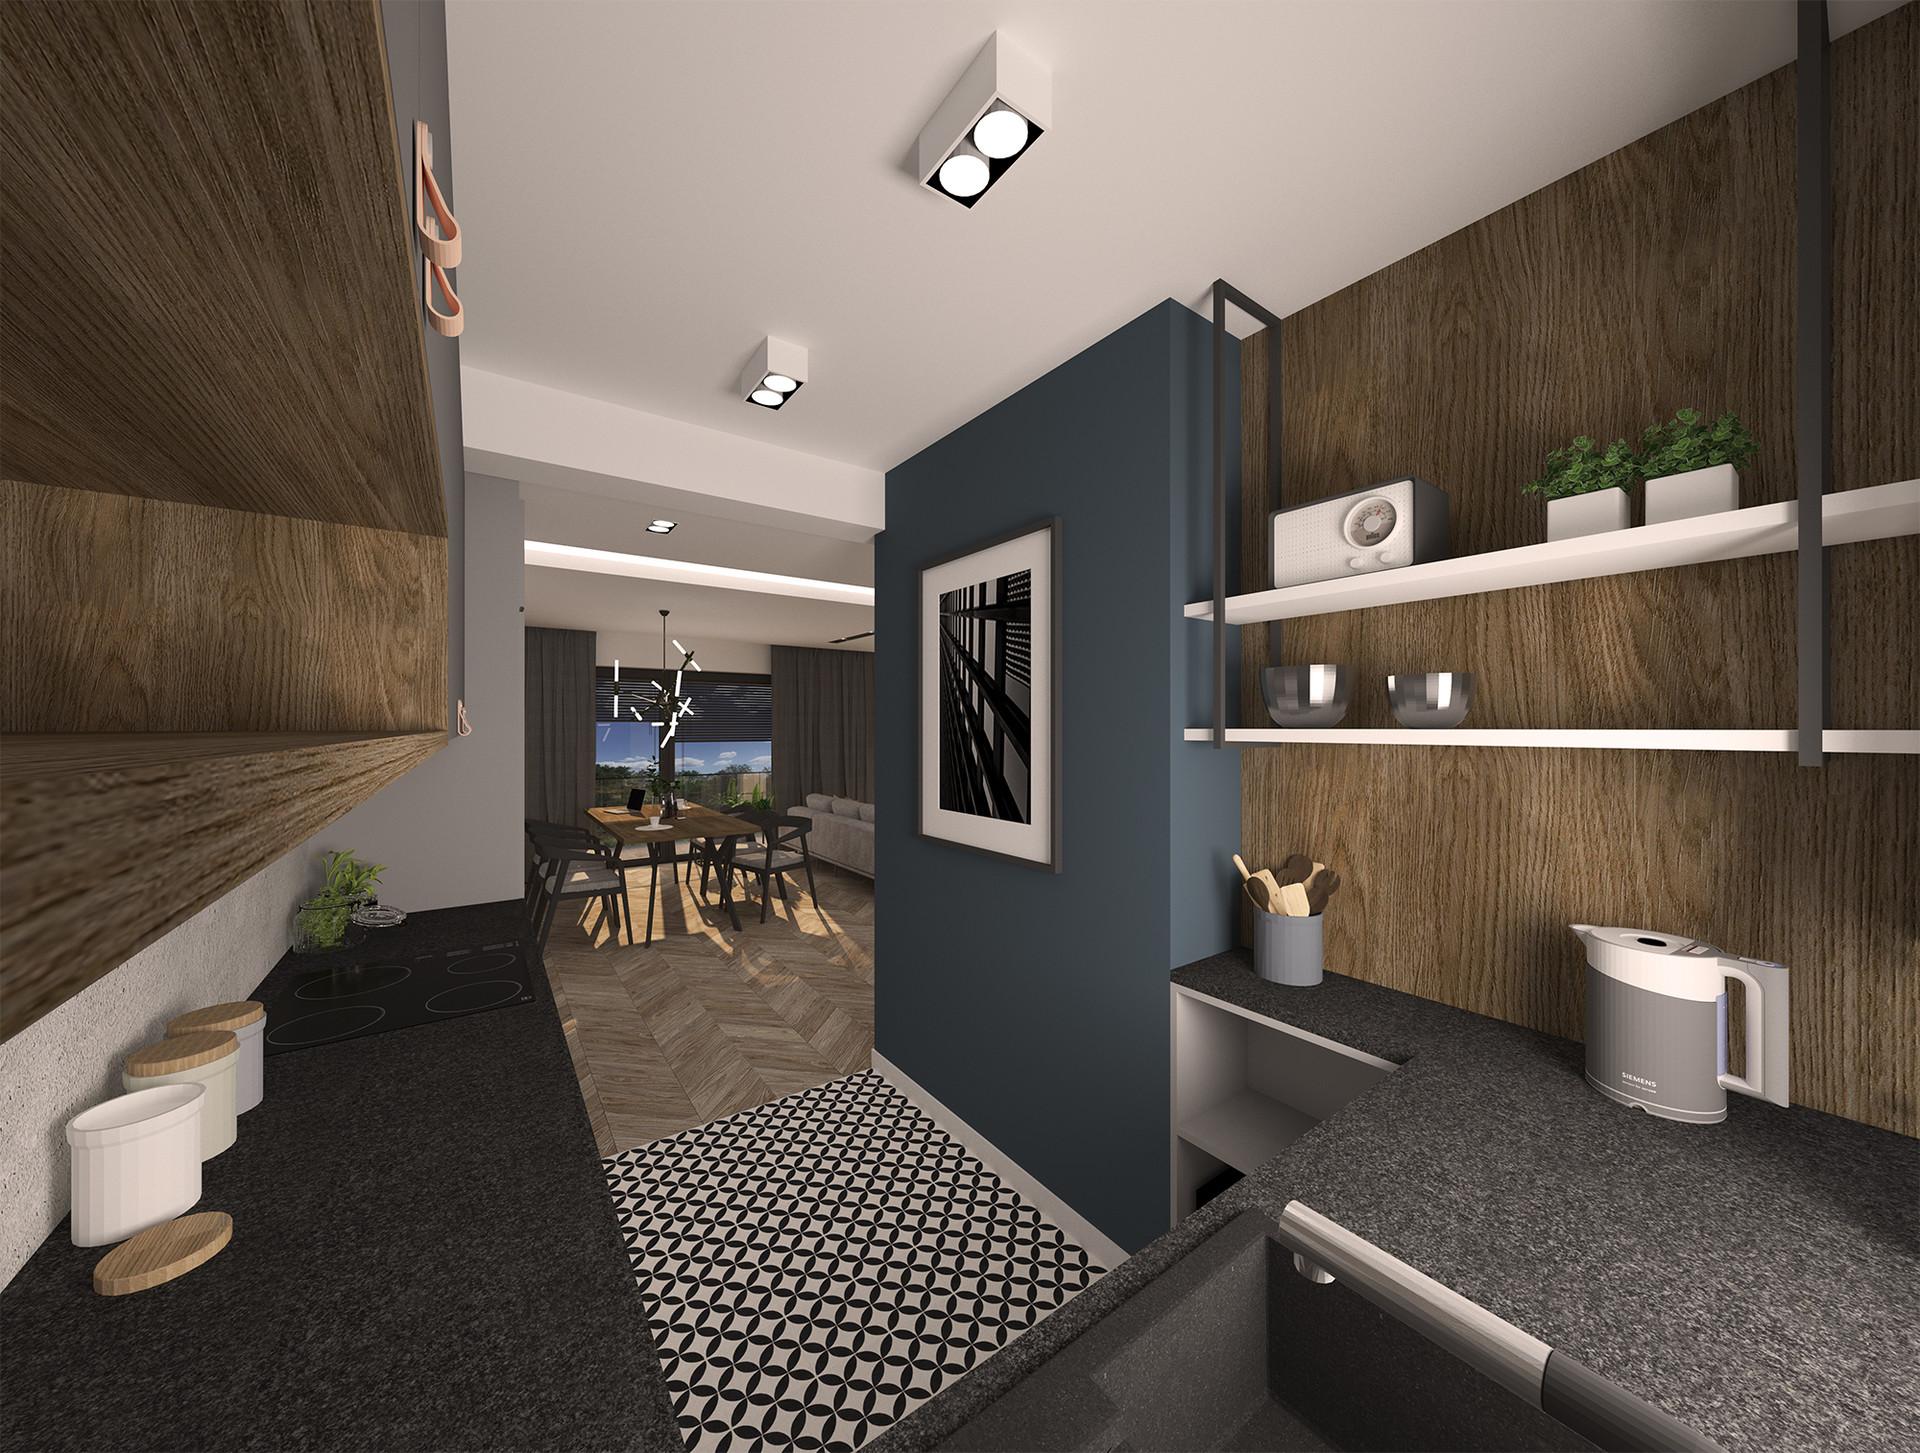 Kitchen Model Design